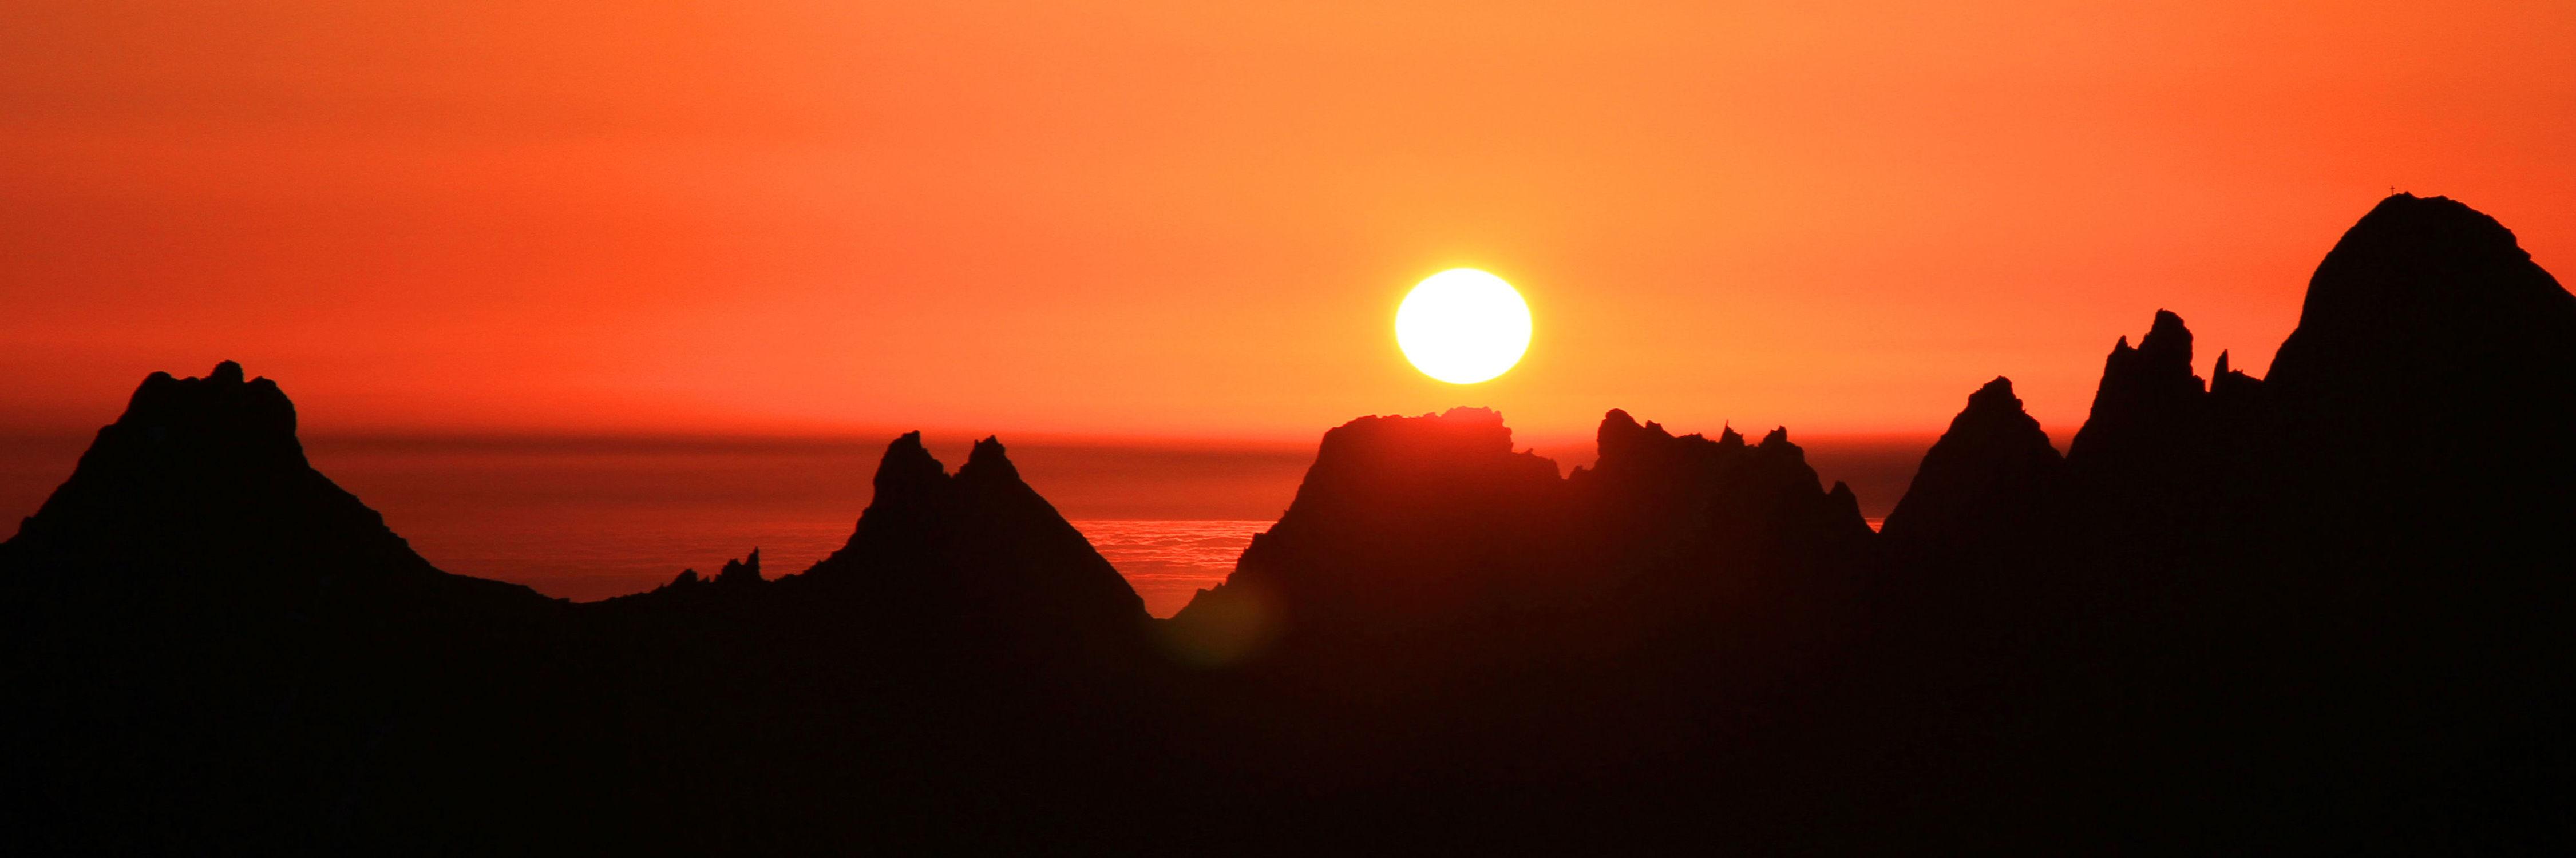 Bild mit Natur, Wasser, Berge und Hügel, Berge, Gewässer, Sonnenuntergang, Sonnenaufgang, Sonne, Meer, See, Sonnenuntergänge, Am Meer, berg, sea, seaside, ozean, sun